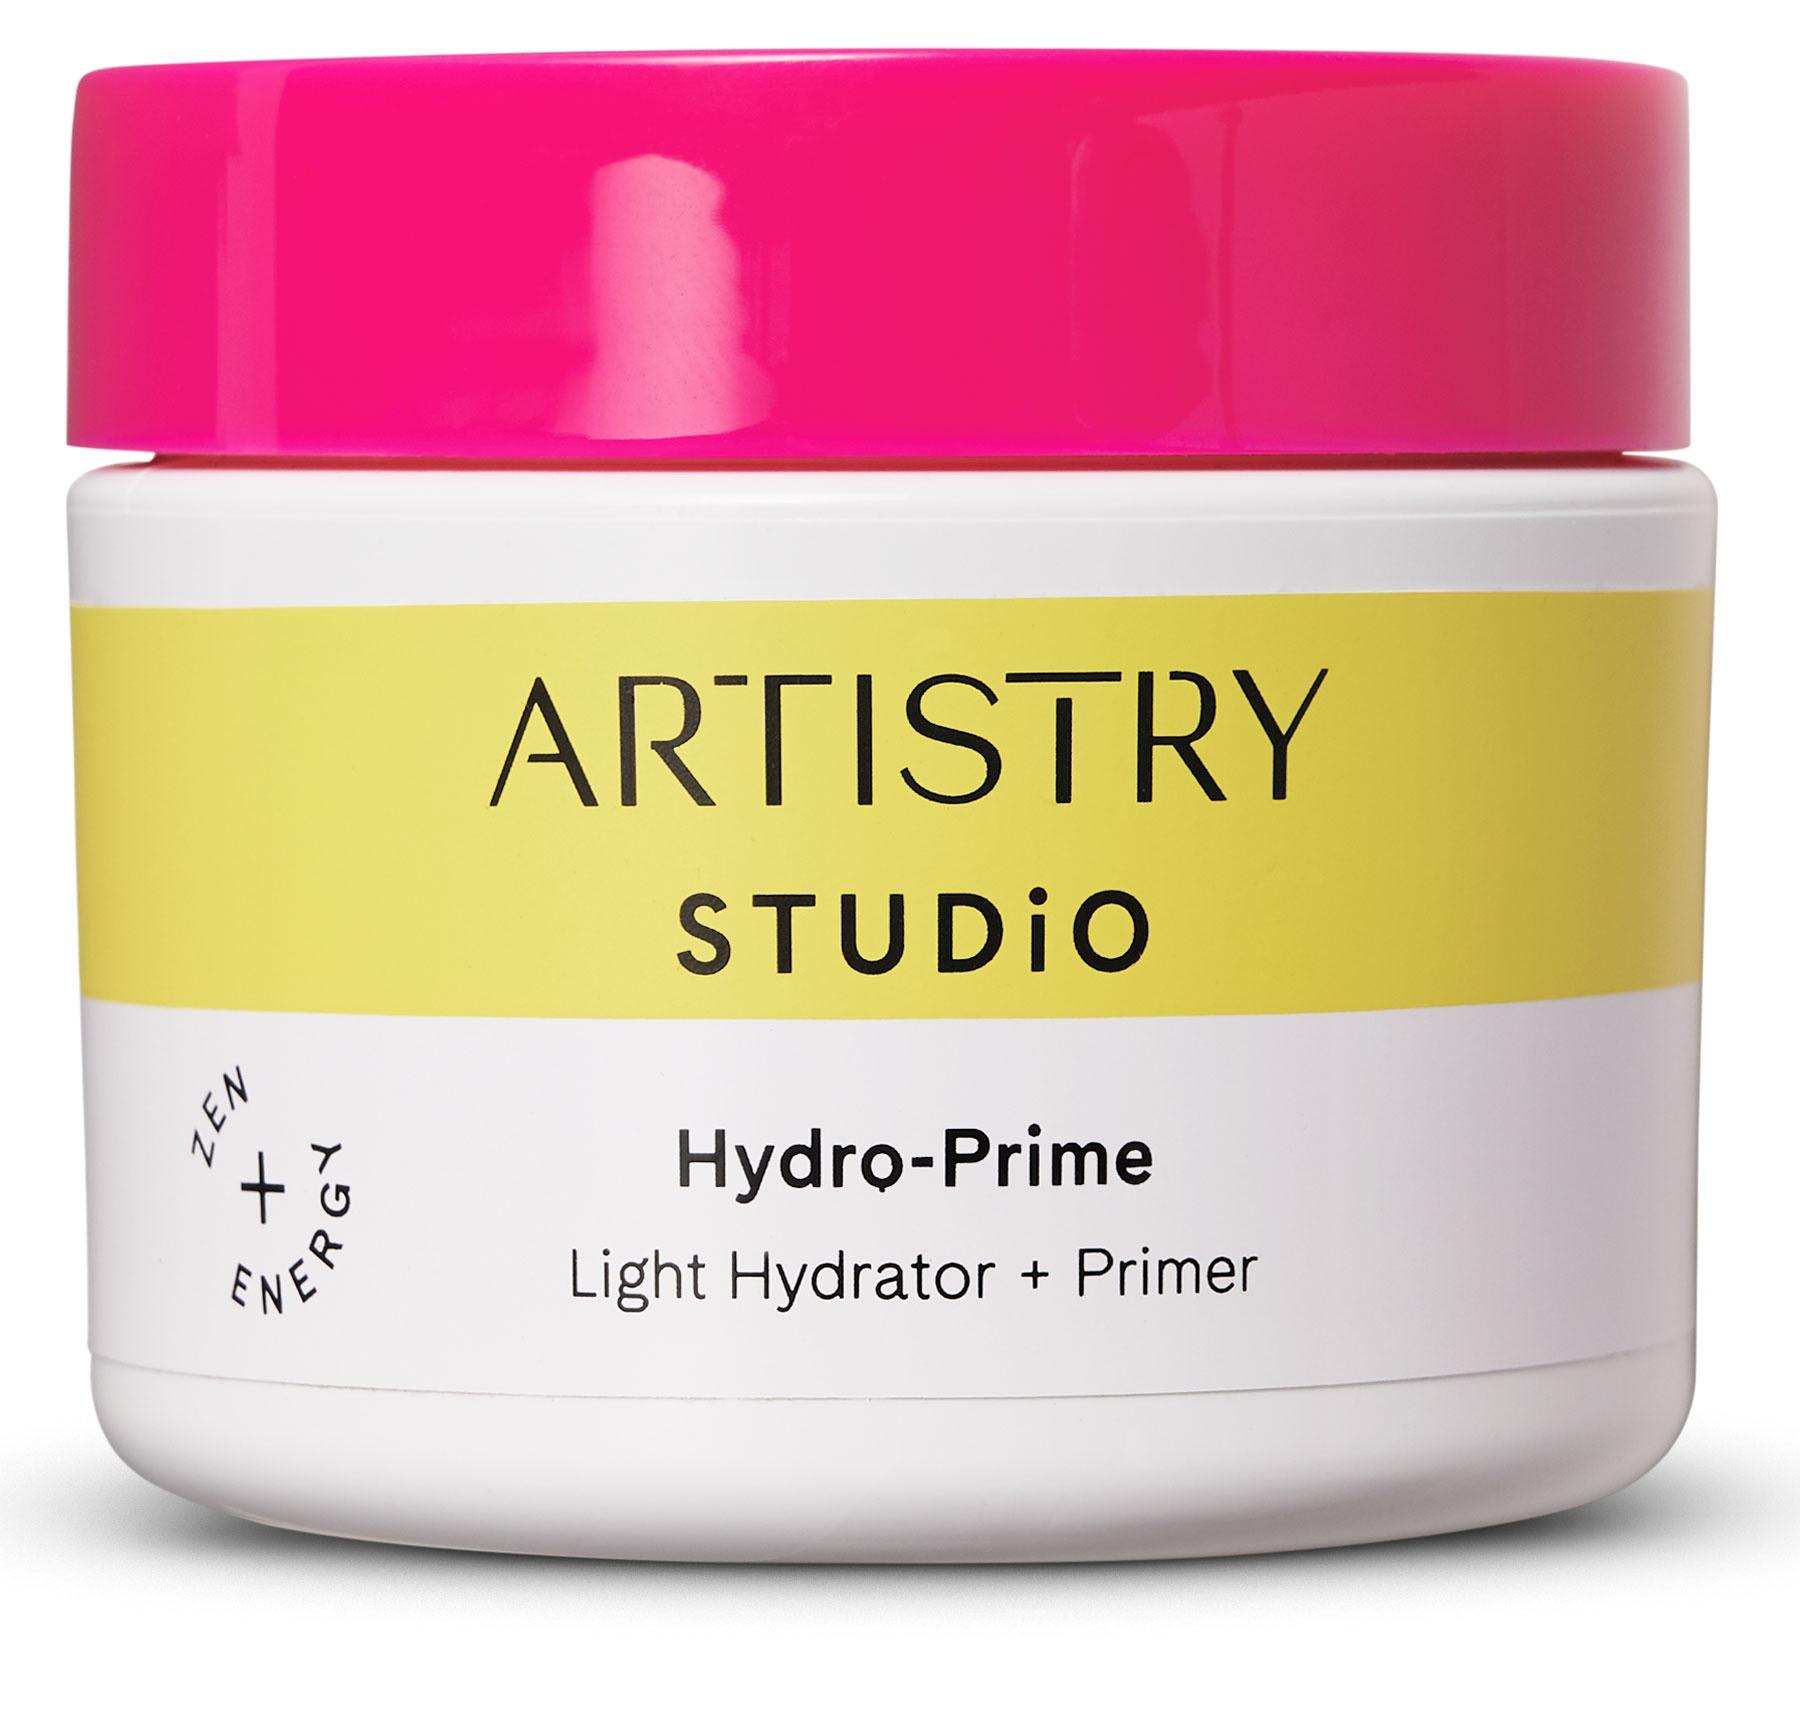 Amway Artistry Studio™ Hydro-Prime Light Hydrator + Primer